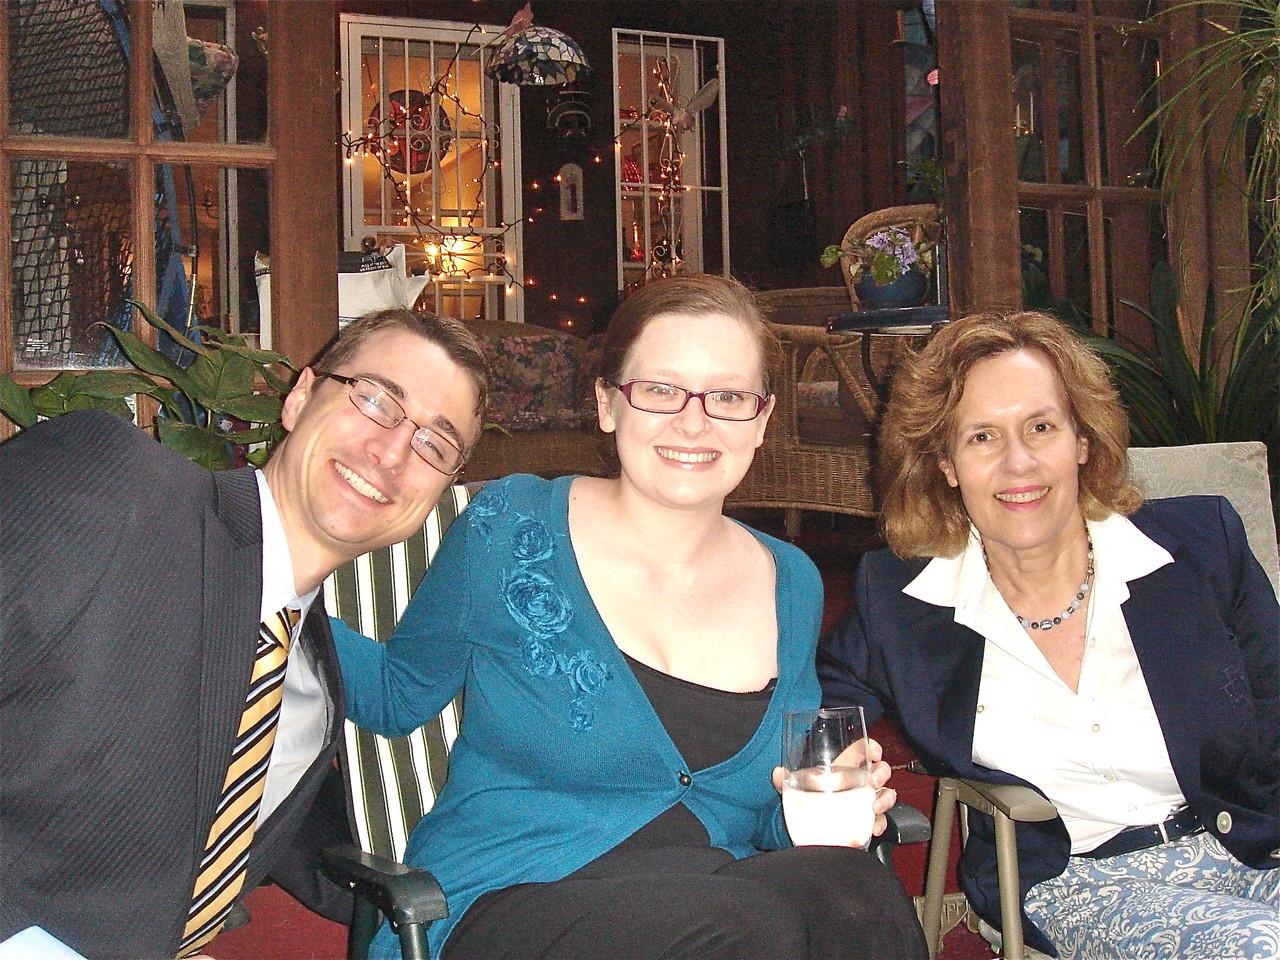 Nate, Jenny Friedman & Lorraine Gudas, 6-14-2013